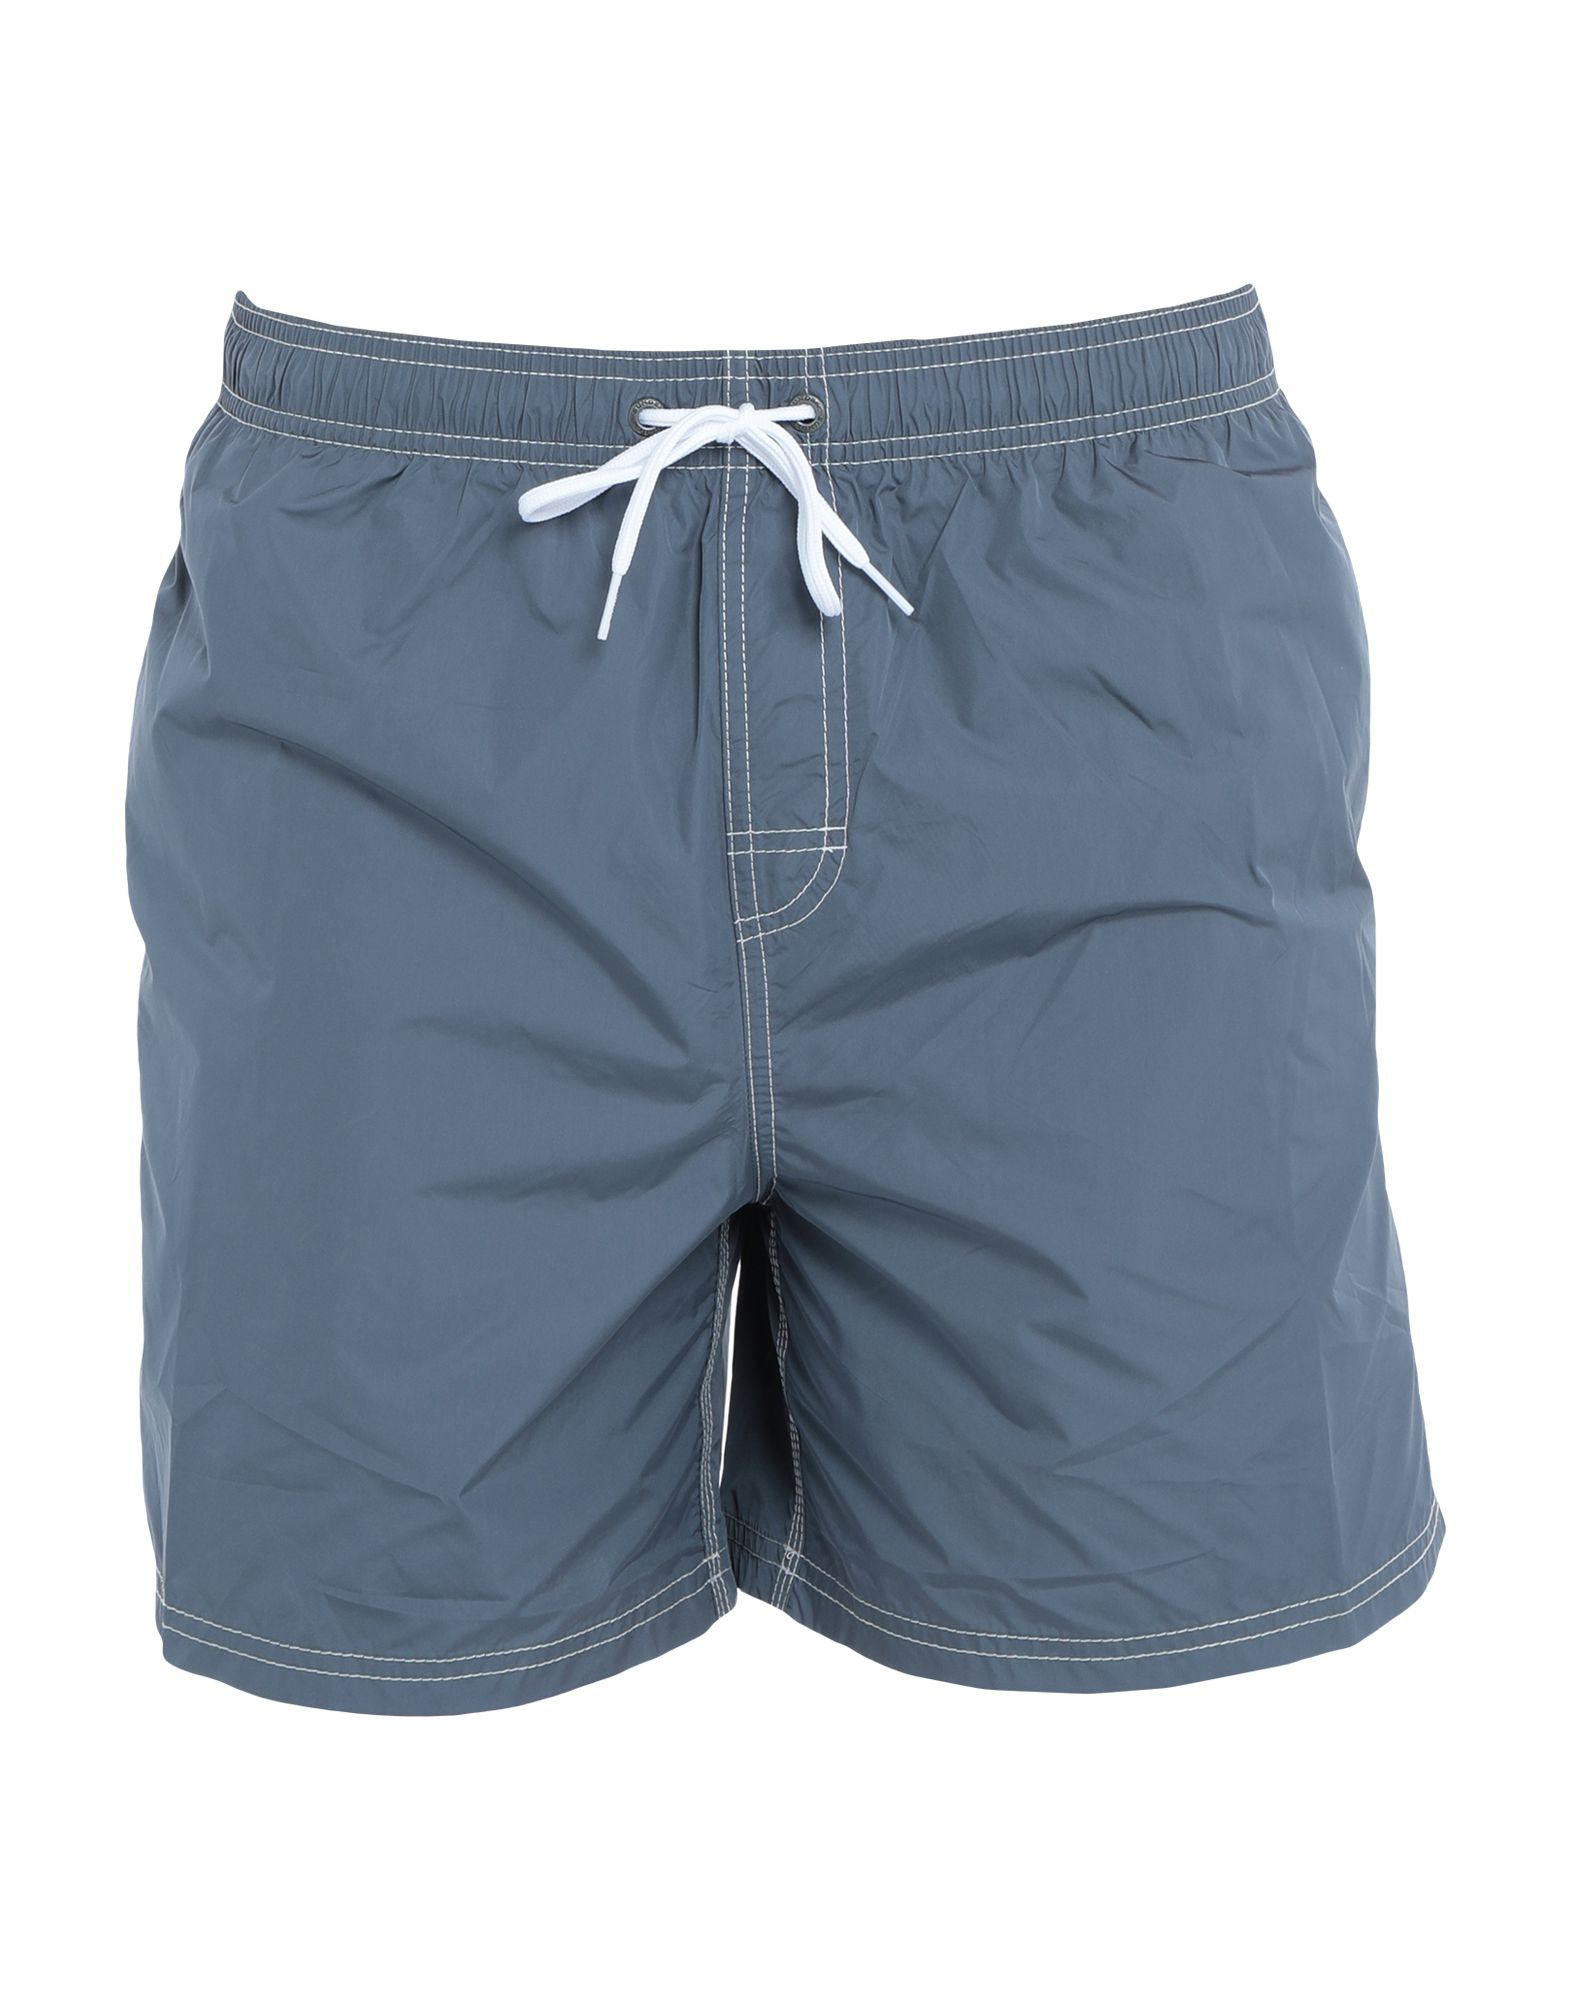 SUNDEK Swim trunks - Item 47248168